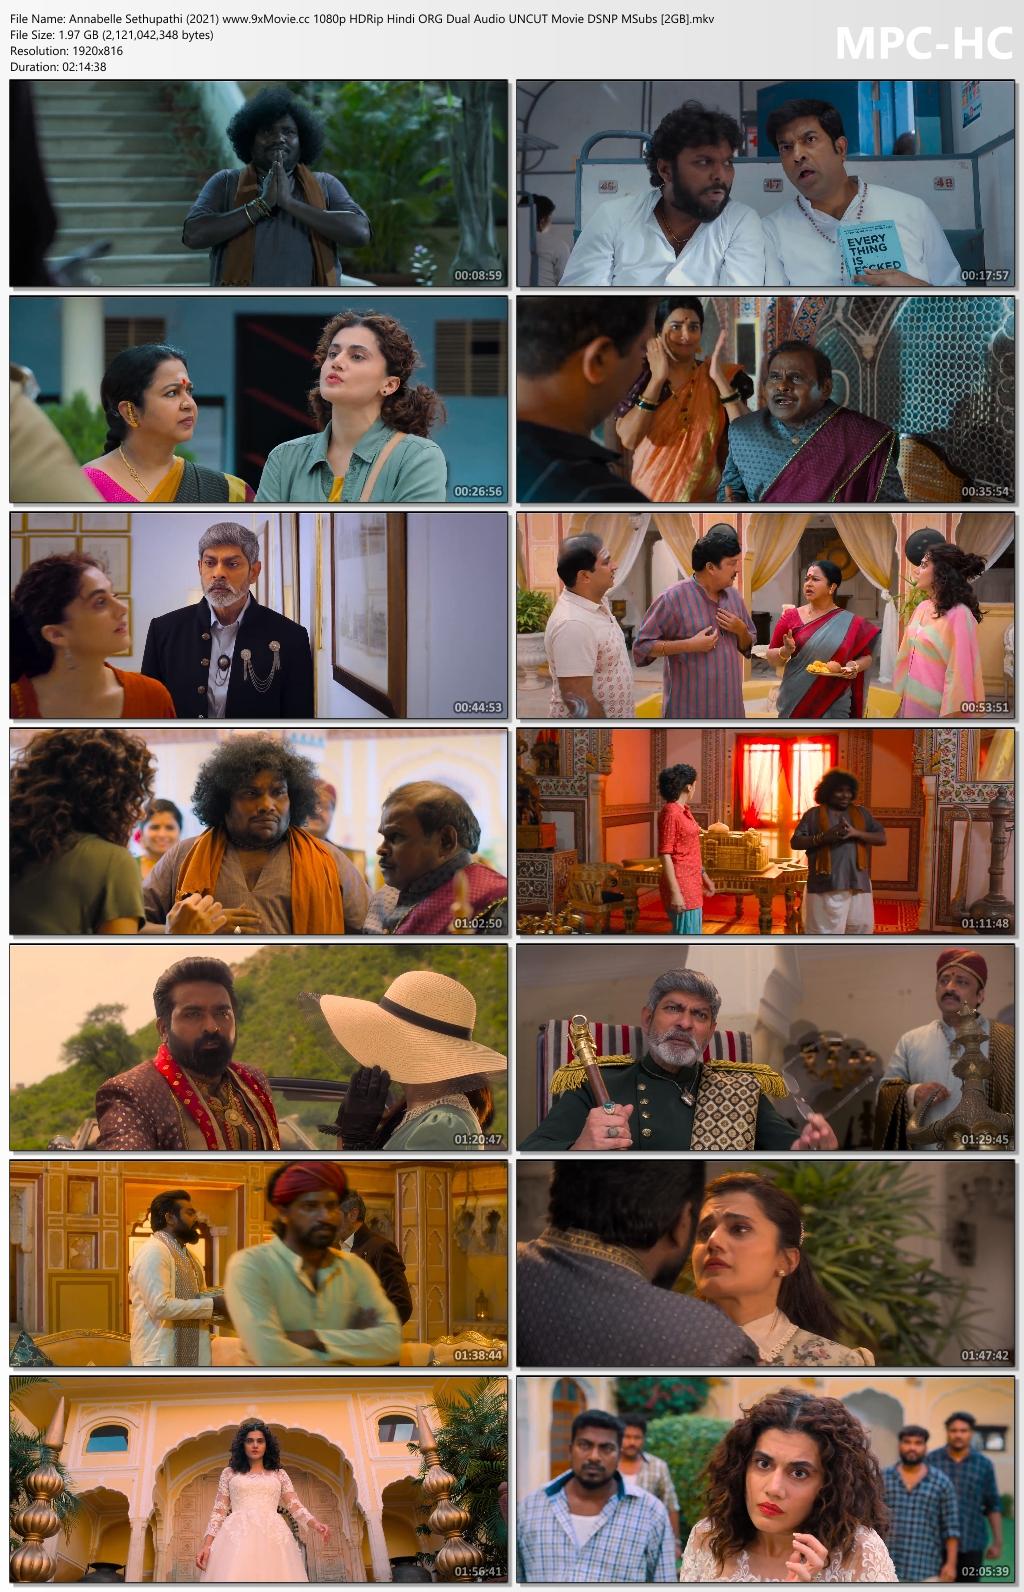 Annabelle-Sethupathi-2021-www-9x-Movie-cc-1080p-HDRip-Hindi-ORG-Dual-Audio-UNCUT-Movie-DSNP-MSubs-2-